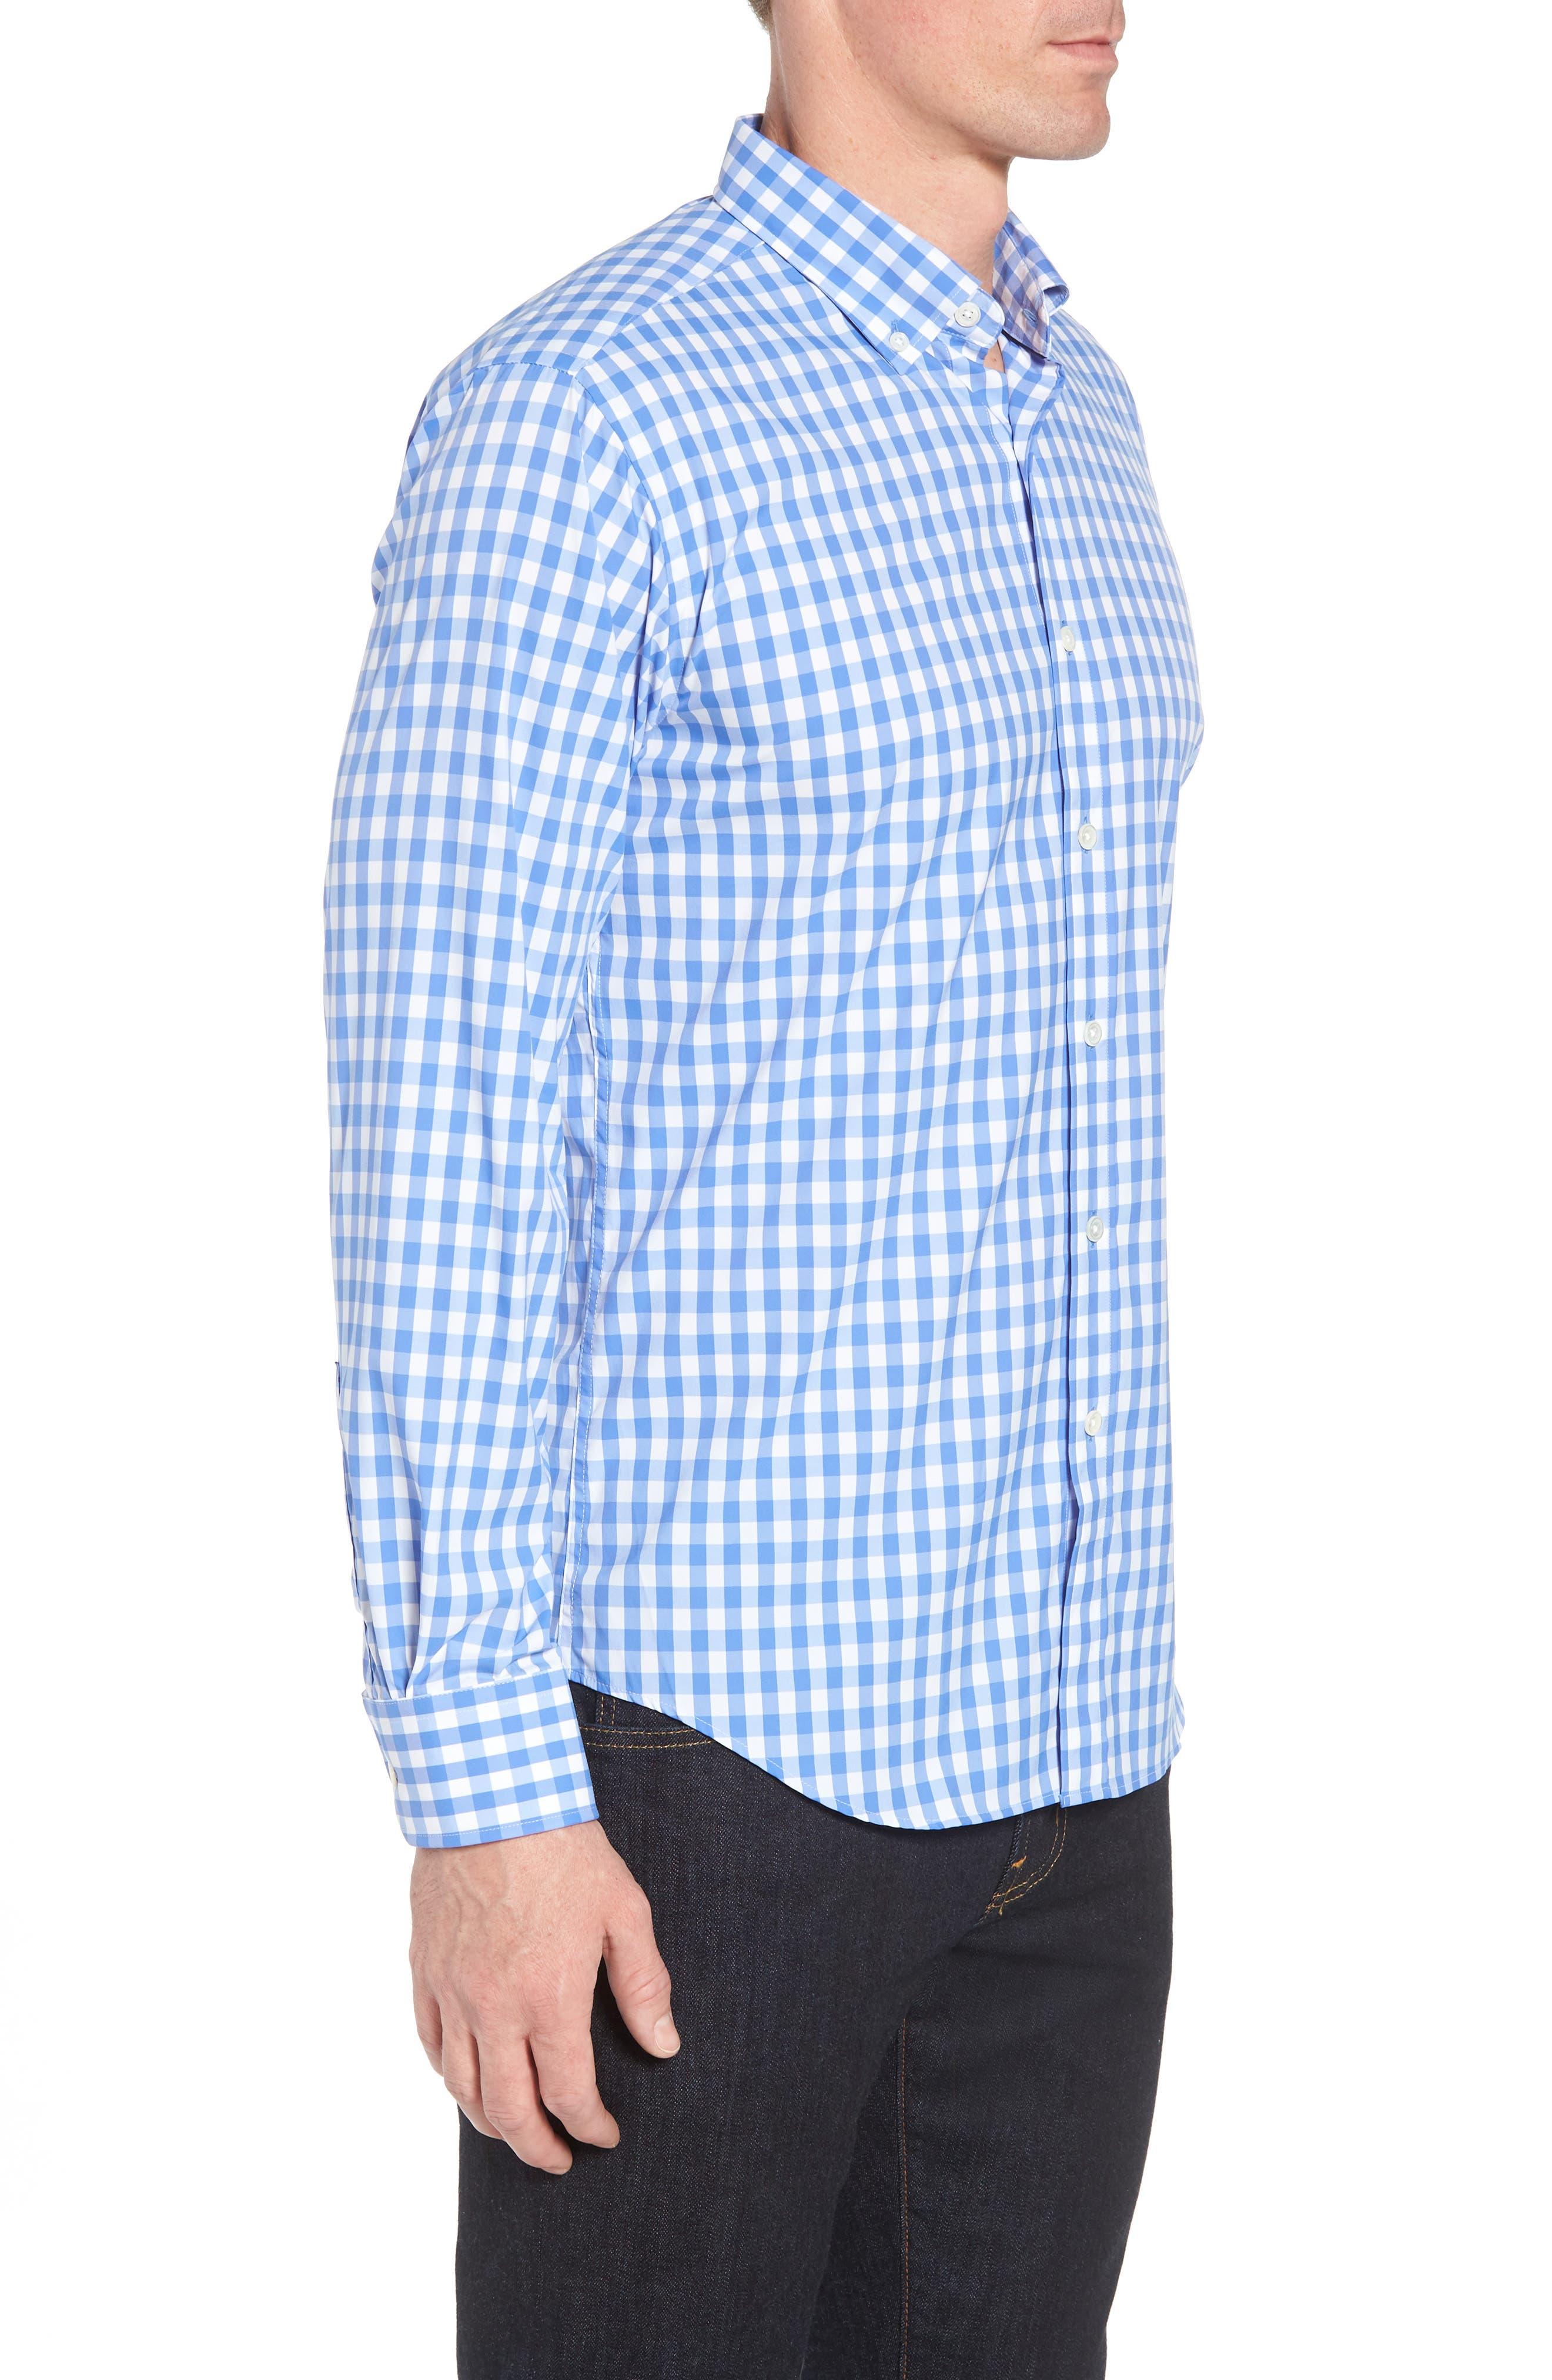 BUGATCHI,                             Shaped Fit Gingham Sport Shirt,                             Alternate thumbnail 3, color,                             422